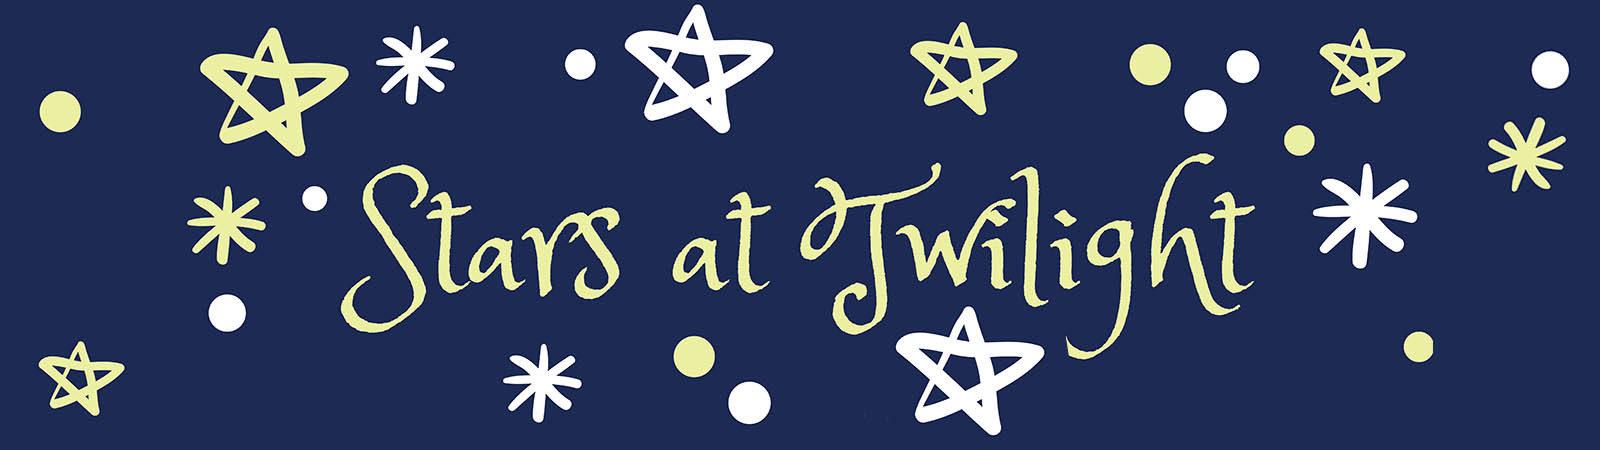 Stars At Twilight Banner